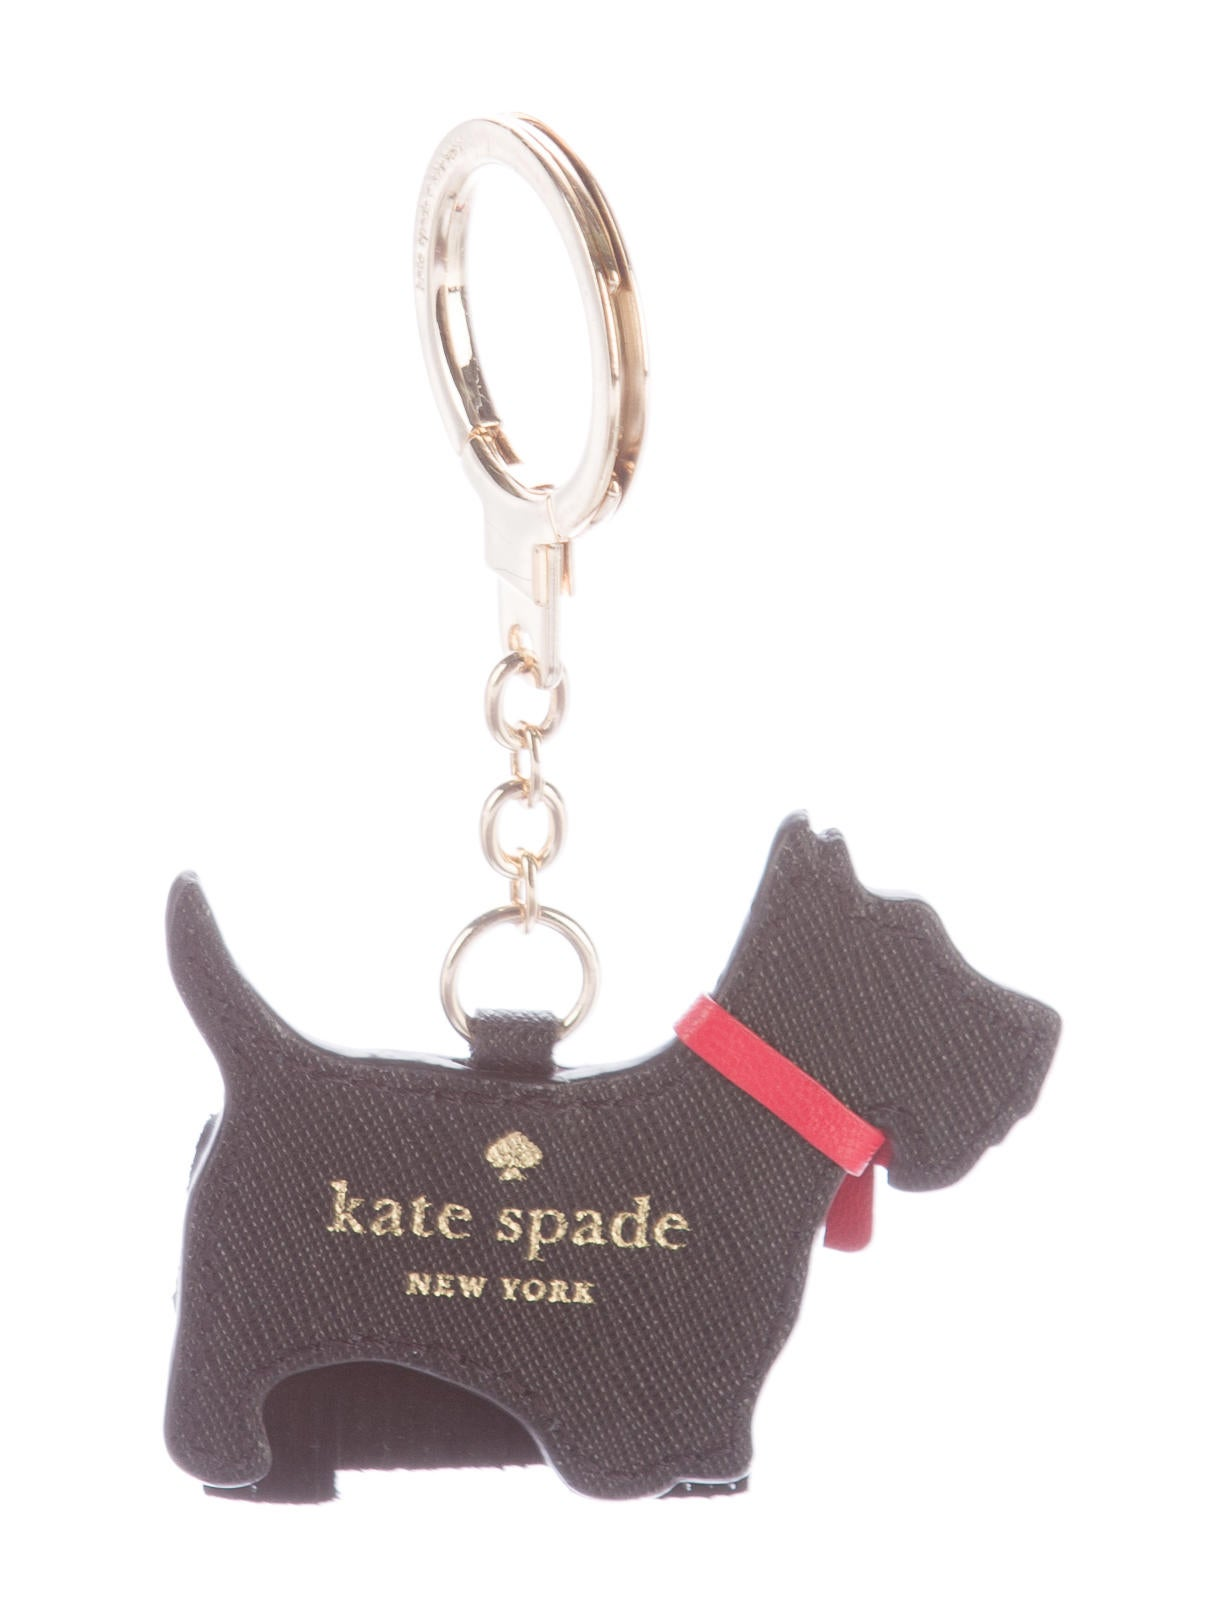 kate spade new york saffiano yorkie keychain accessories wka47675 the realreal. Black Bedroom Furniture Sets. Home Design Ideas